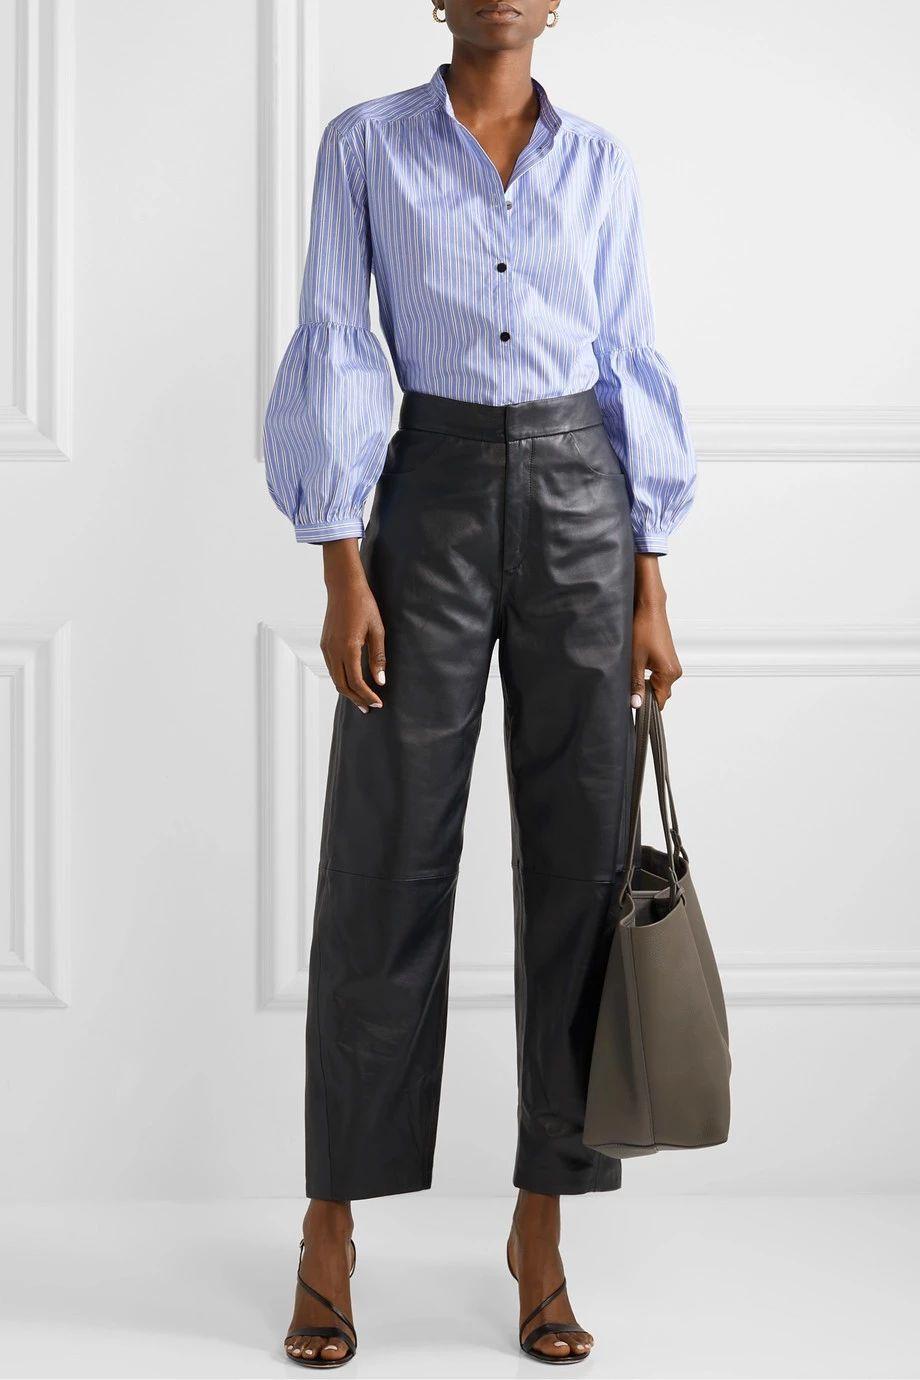 ��a�y�$ycny�N[�Z�nK��ih_cefinn条纹纯棉牛津纺衬衫 (net-a-porter有售) 参考价格:约cny 1